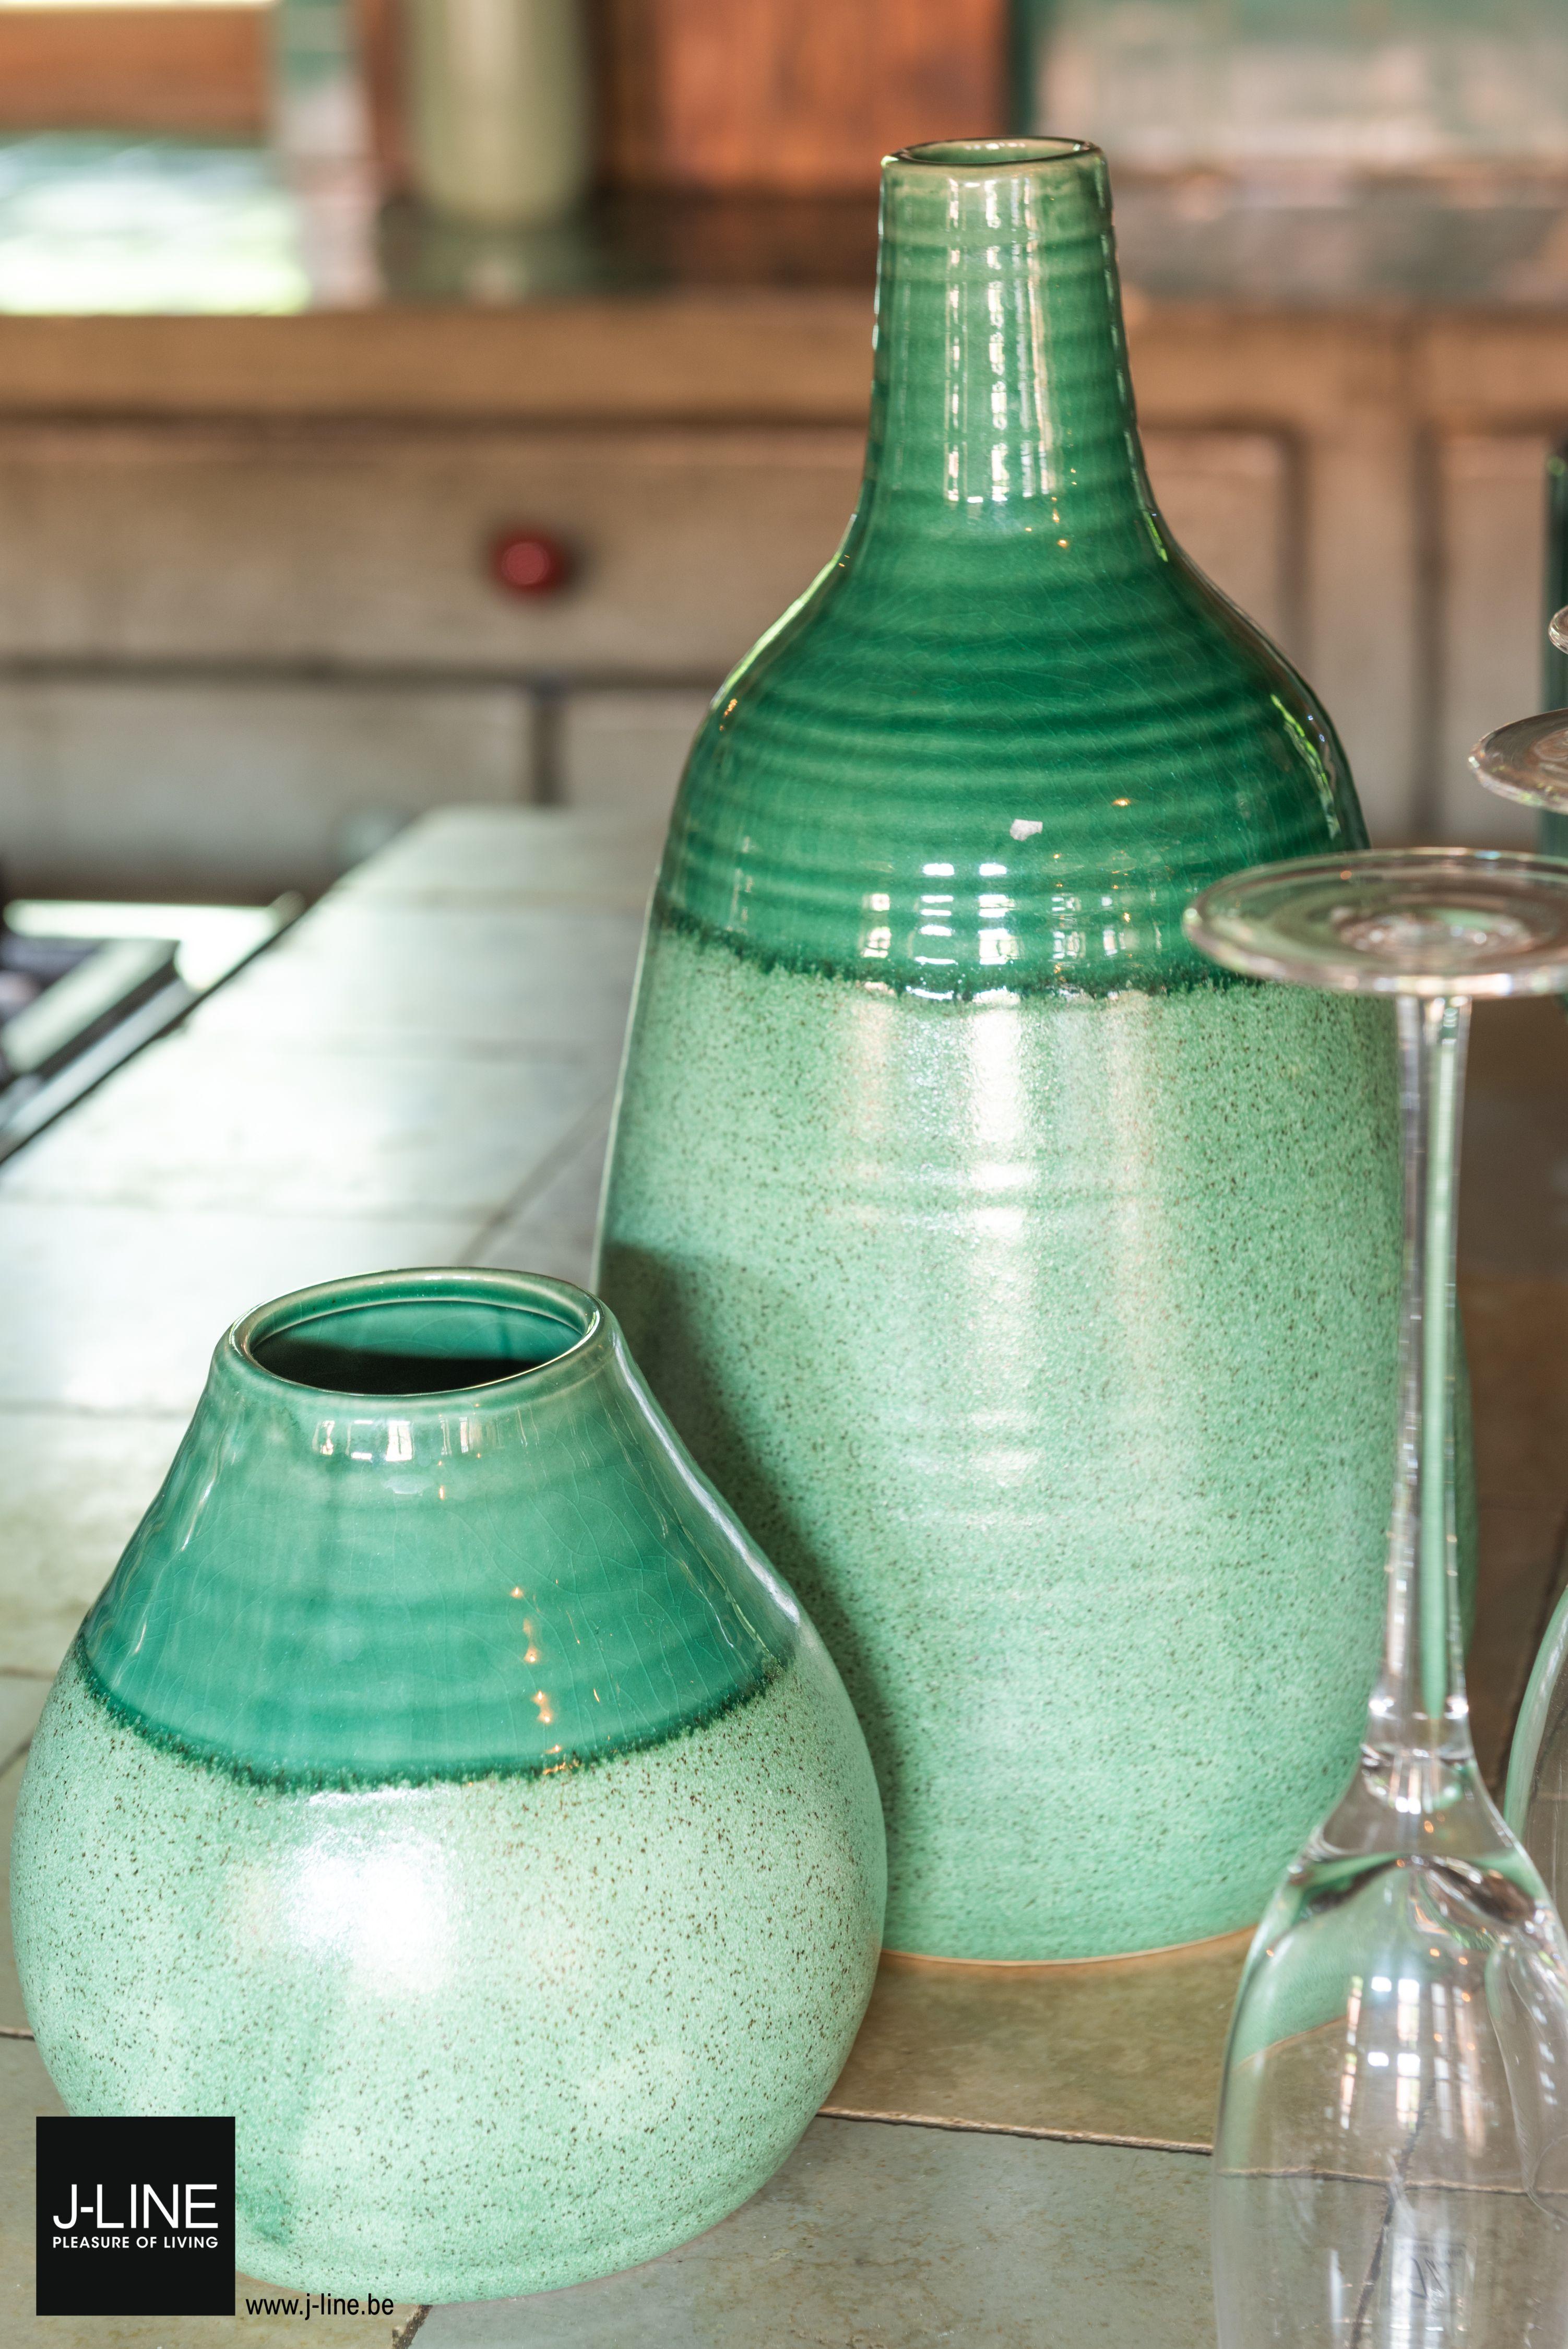 Jline Decoration Bistro Retro Spring Summer Ss2019 New Collection Vases Earthenware Green Fluted Glass Kitchen Pleasureofliving Jlinedecoration